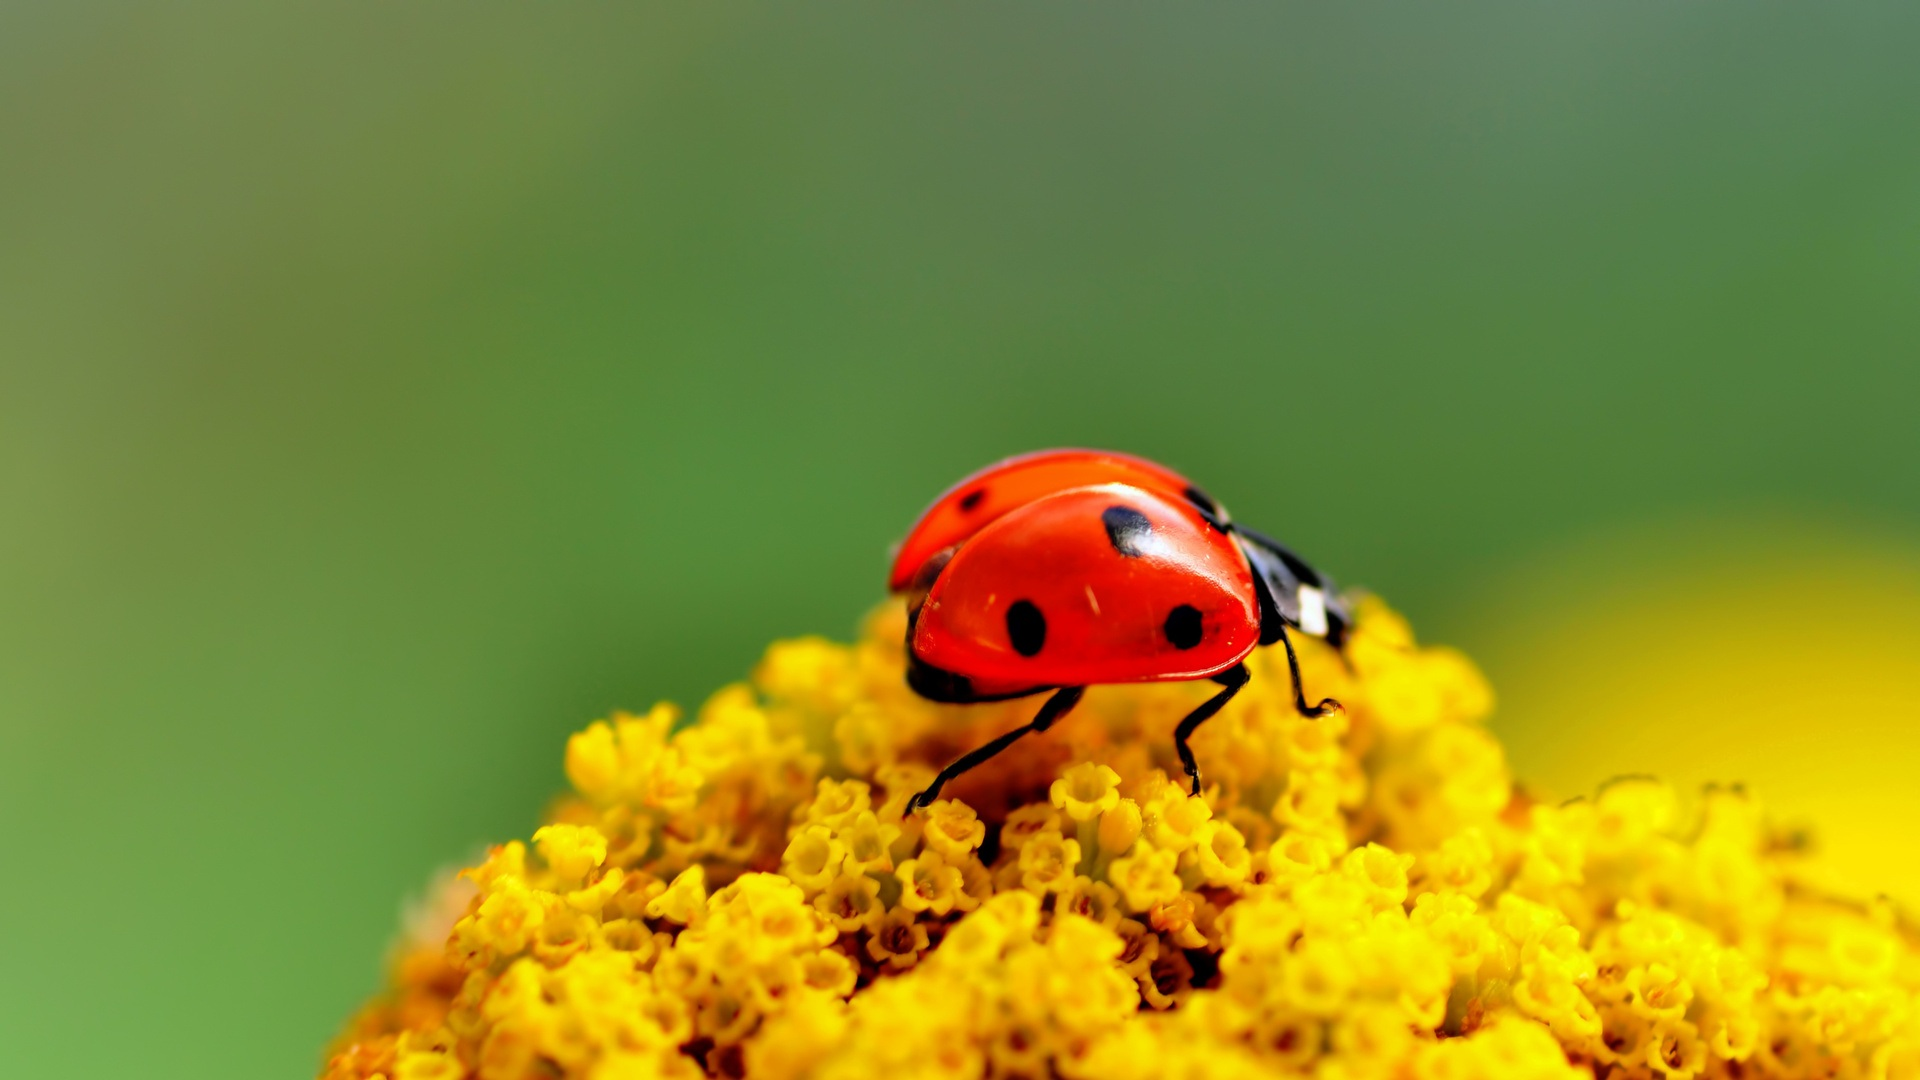 pretty ladybug wallpaper 43697